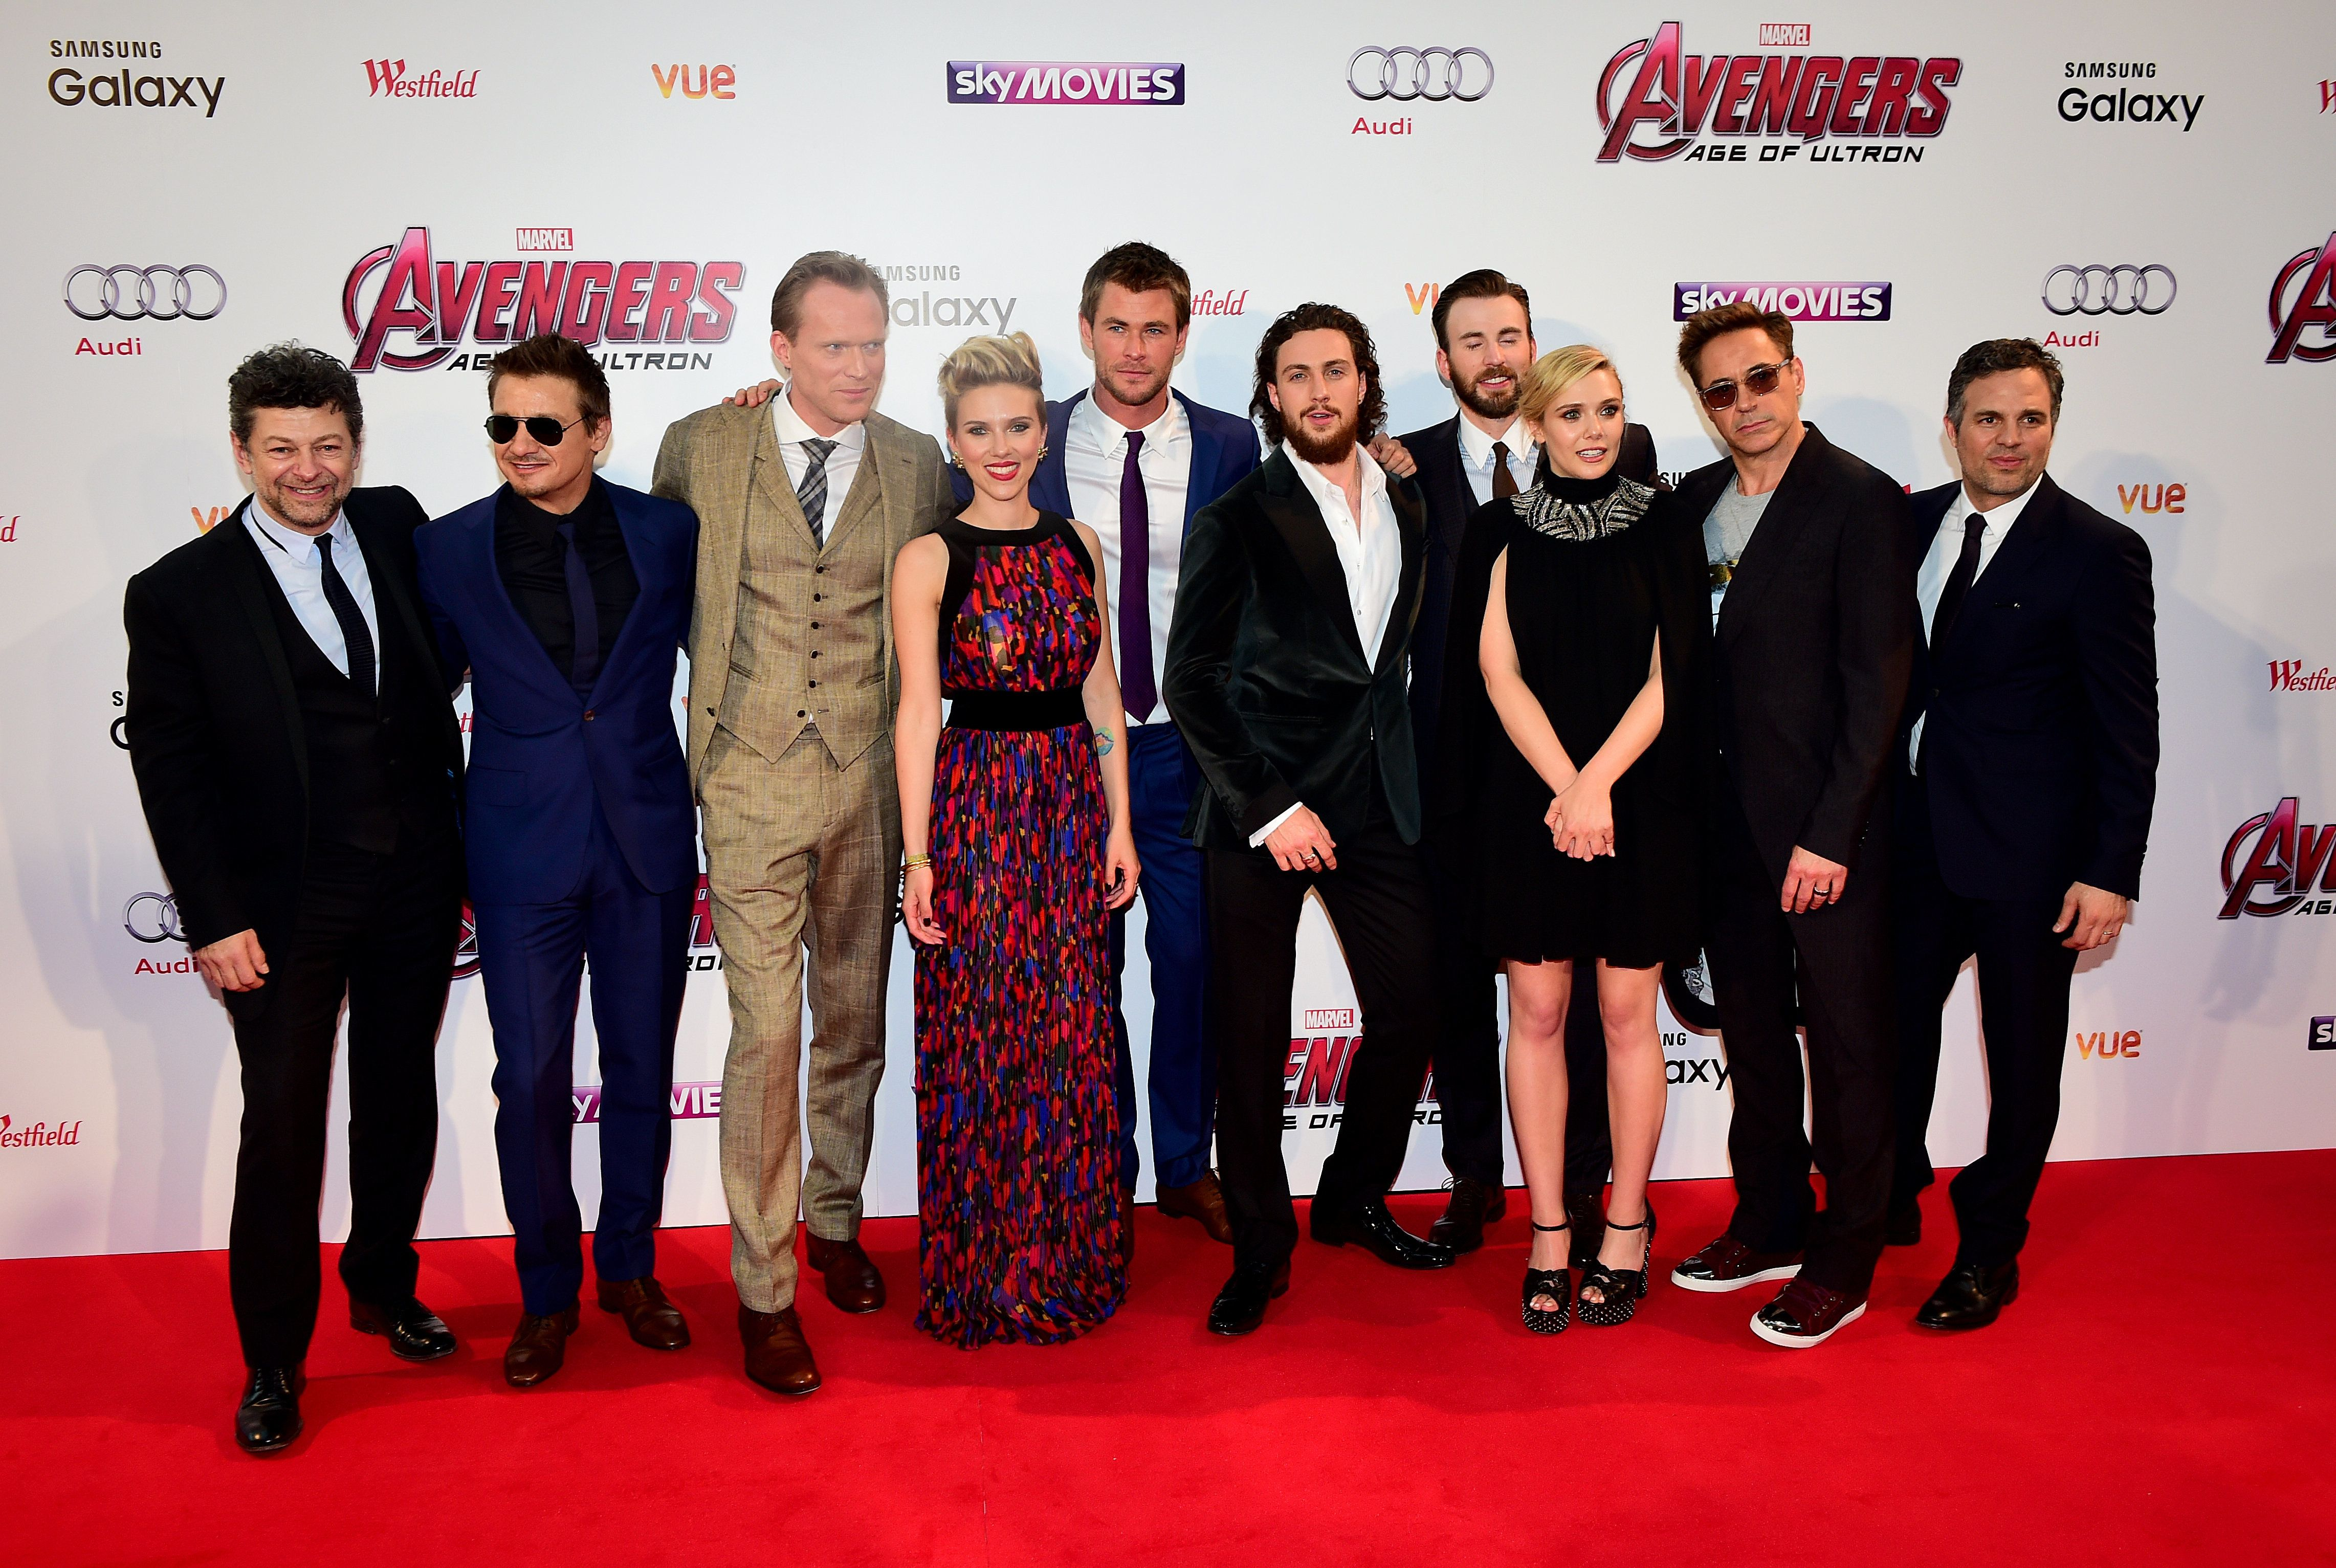 O Iron Man, η Black Widow, ο Captain America, ο Thor και ο Hawkeye έκαναν το ίδιο